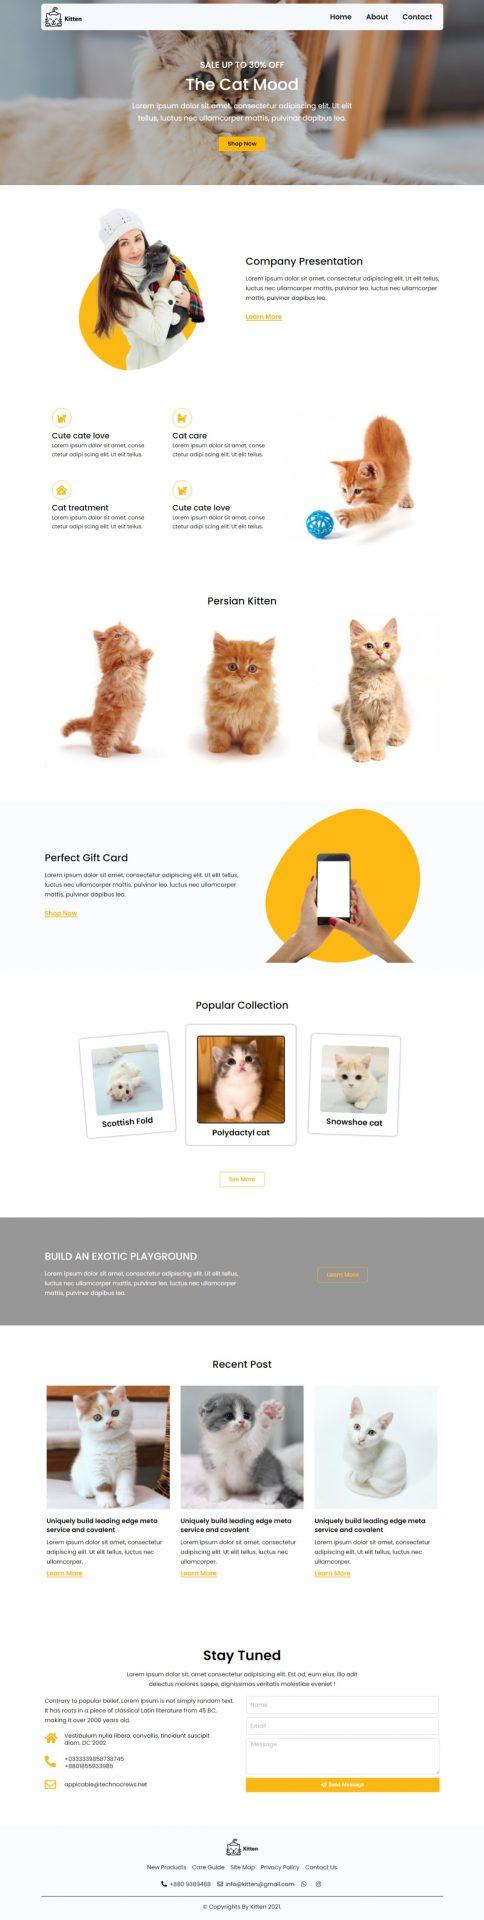 kitten-pet-care-pet-shop-website-template